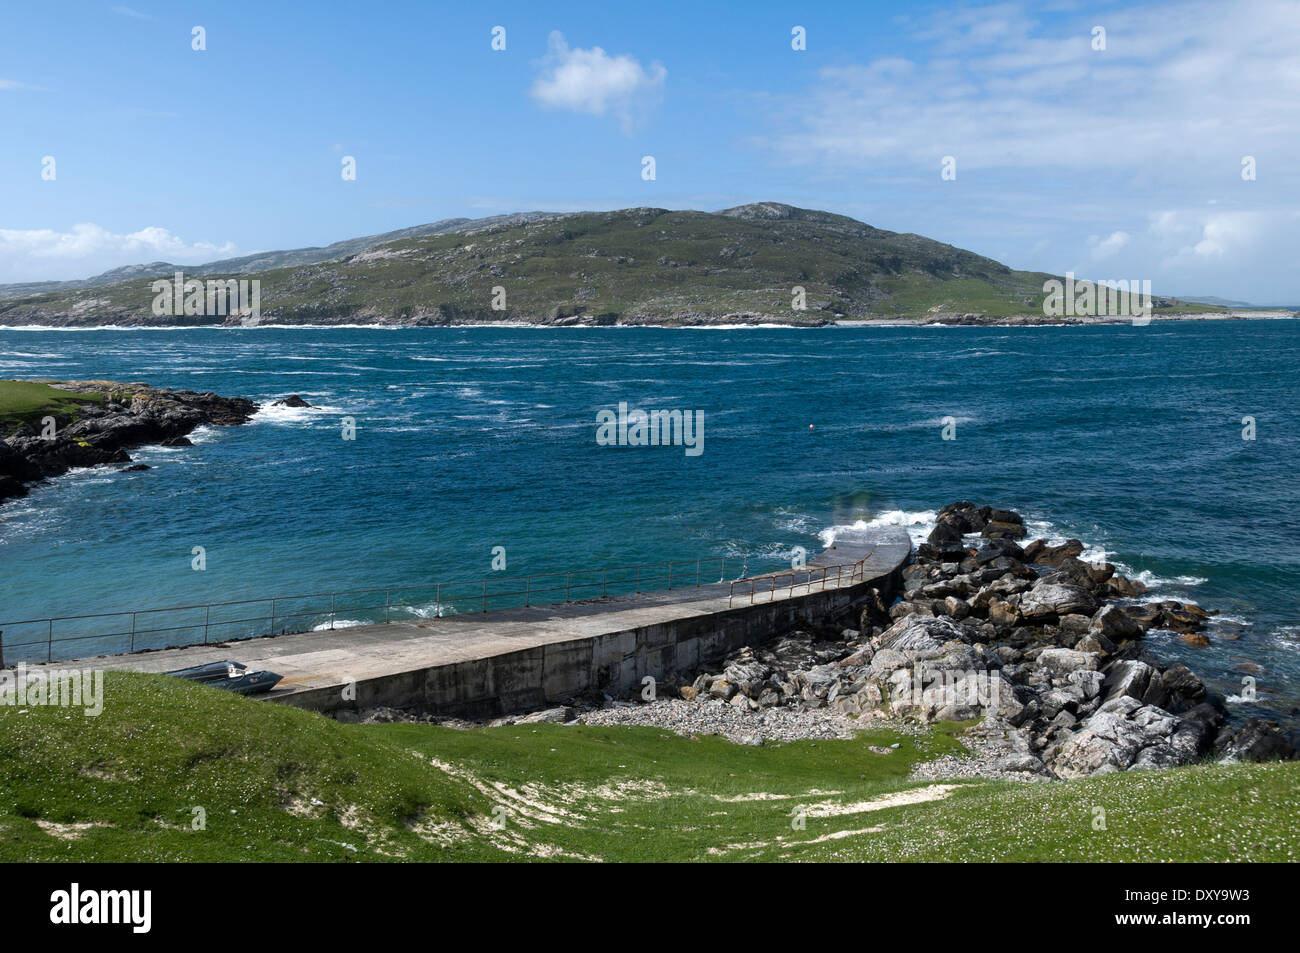 The island of Scarp from the jetty at Port a' Tuath near Huisinis, Harris, Western Isles, Scotland, UK. - Stock Image